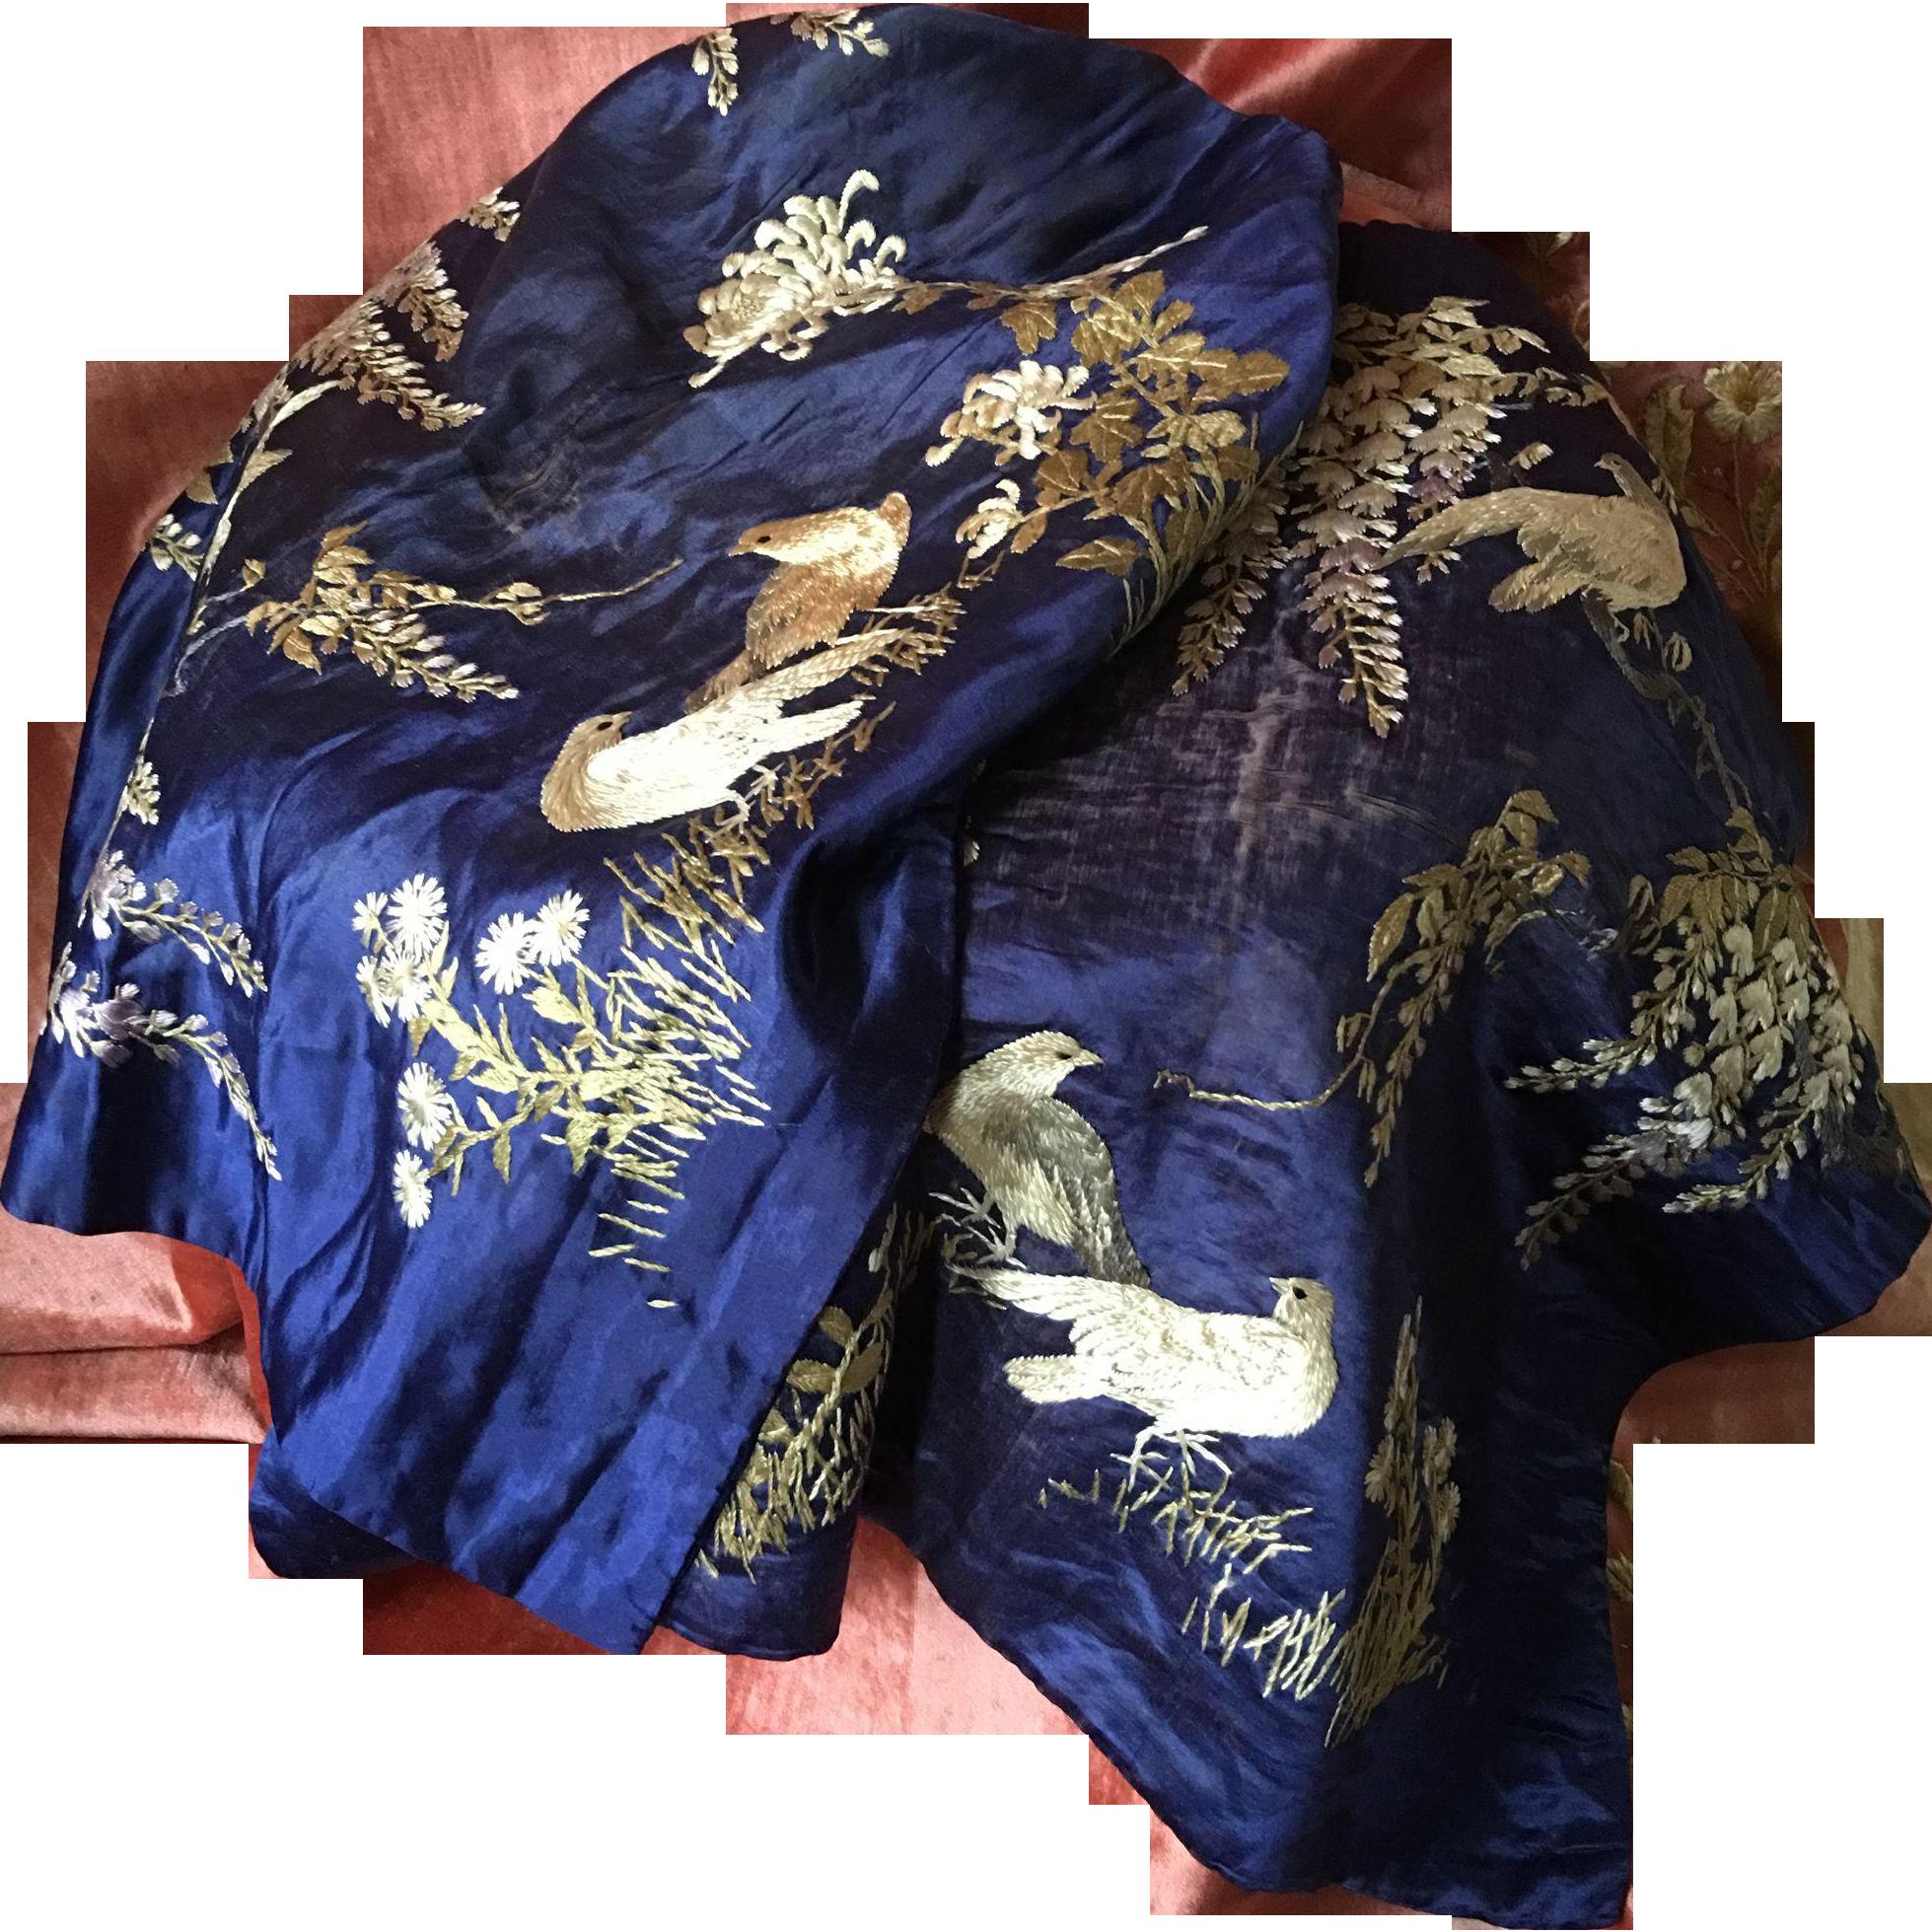 Stunning pair of Midnight Blue Silk Chinese Embroidered Panels circa 1900